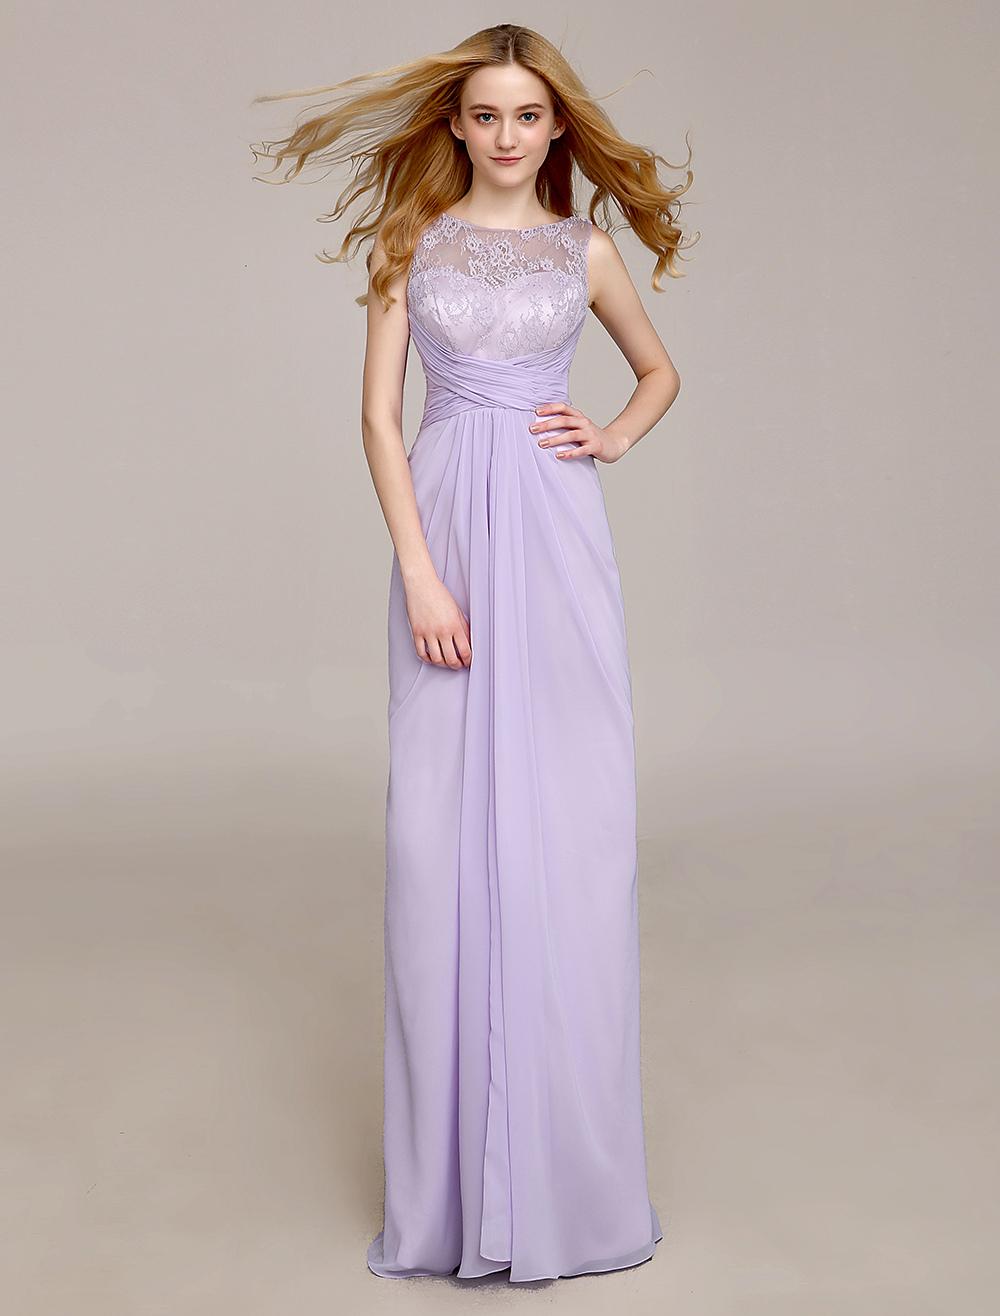 Jewel Neck Bridesmaid Dress With Draped Sheath Milanoo